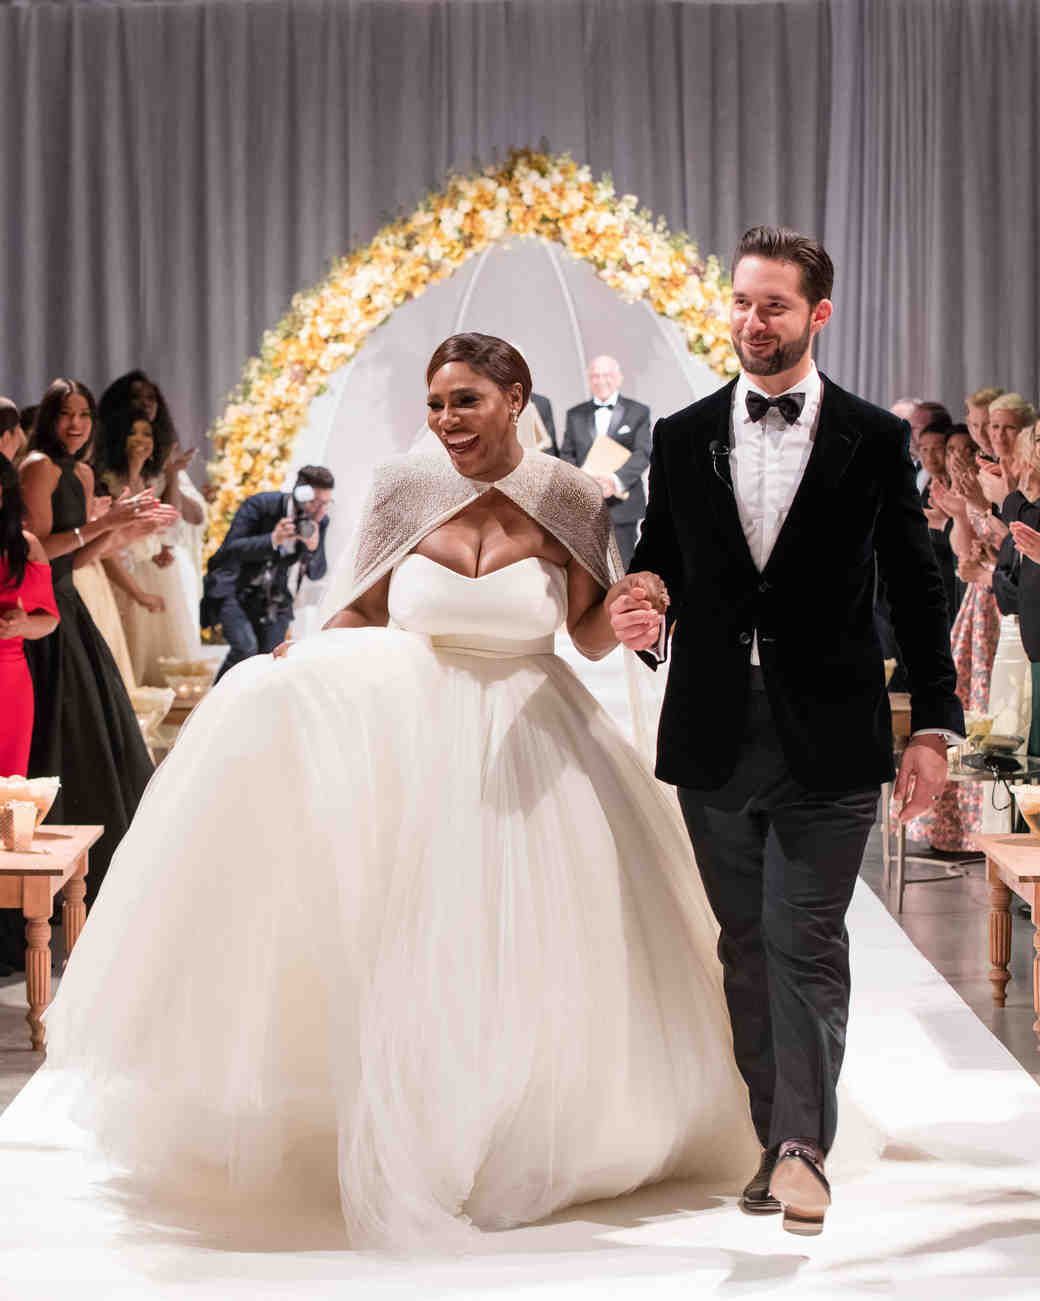 Serena Williams and Alexis Ohanian Wedding Ceremony